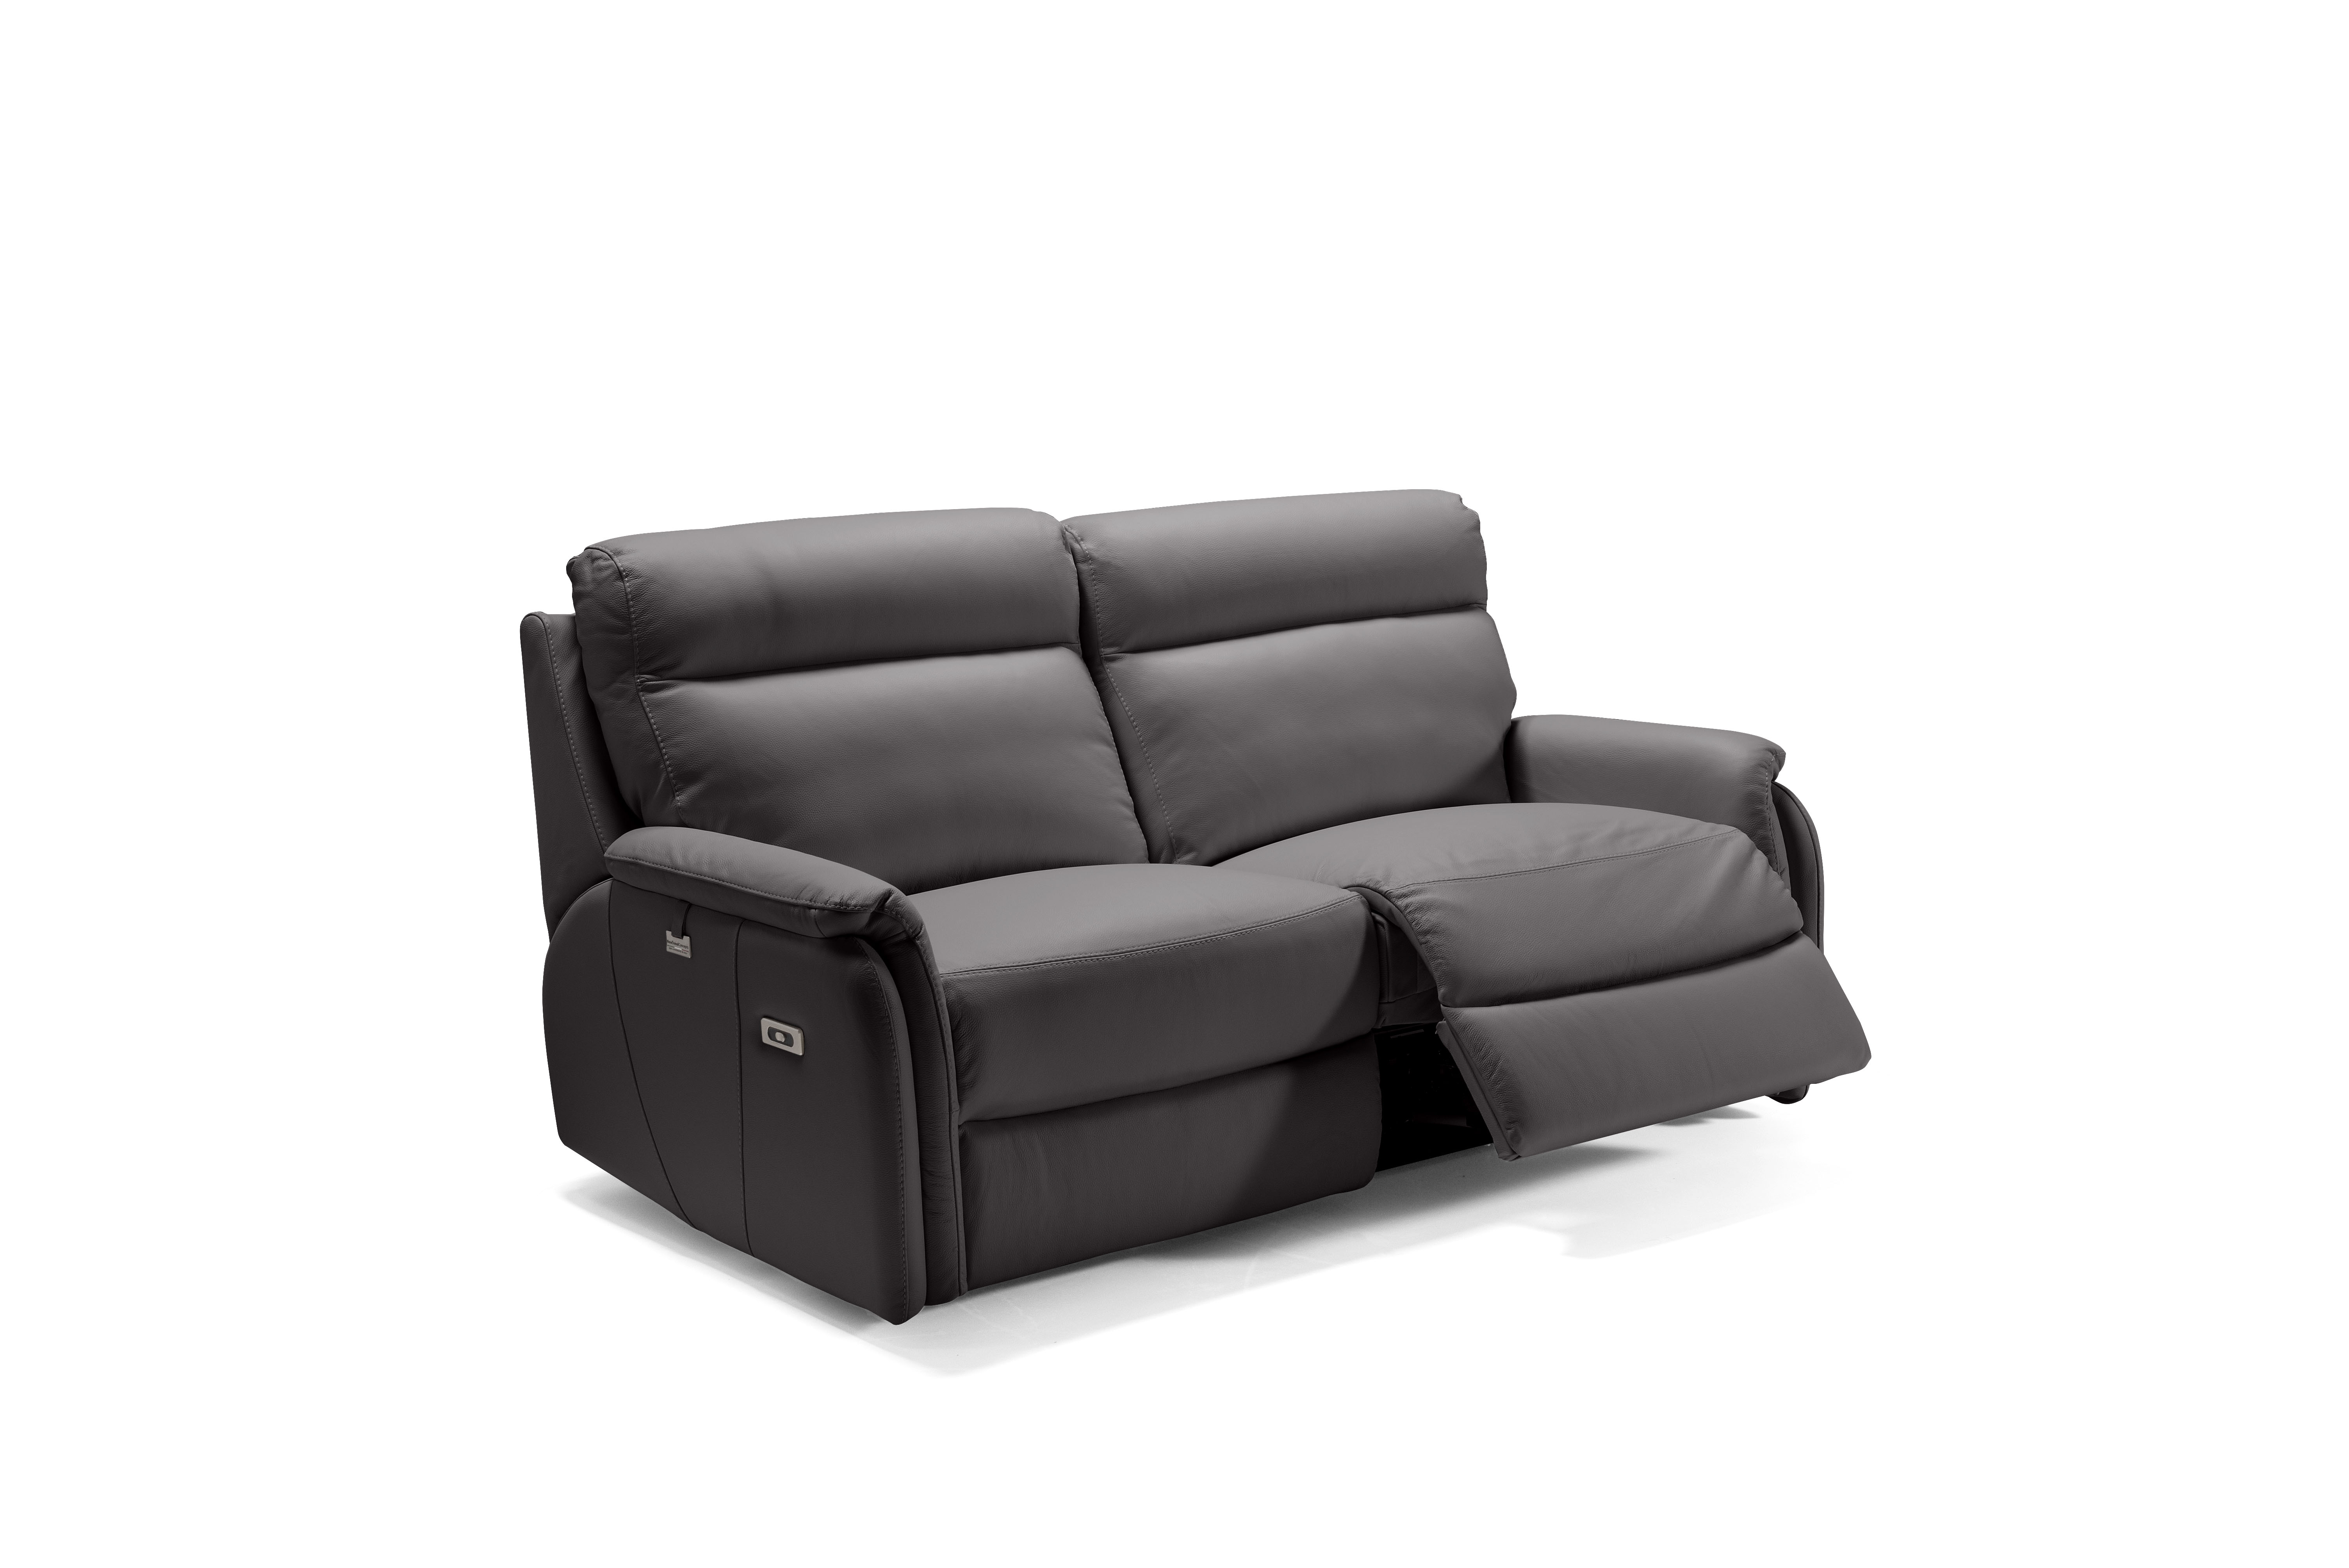 FOX Italian Leather Recliner 3 & 2 Seat Sofa - Dark Grey Grigio RRP £4800 - Image 2 of 4